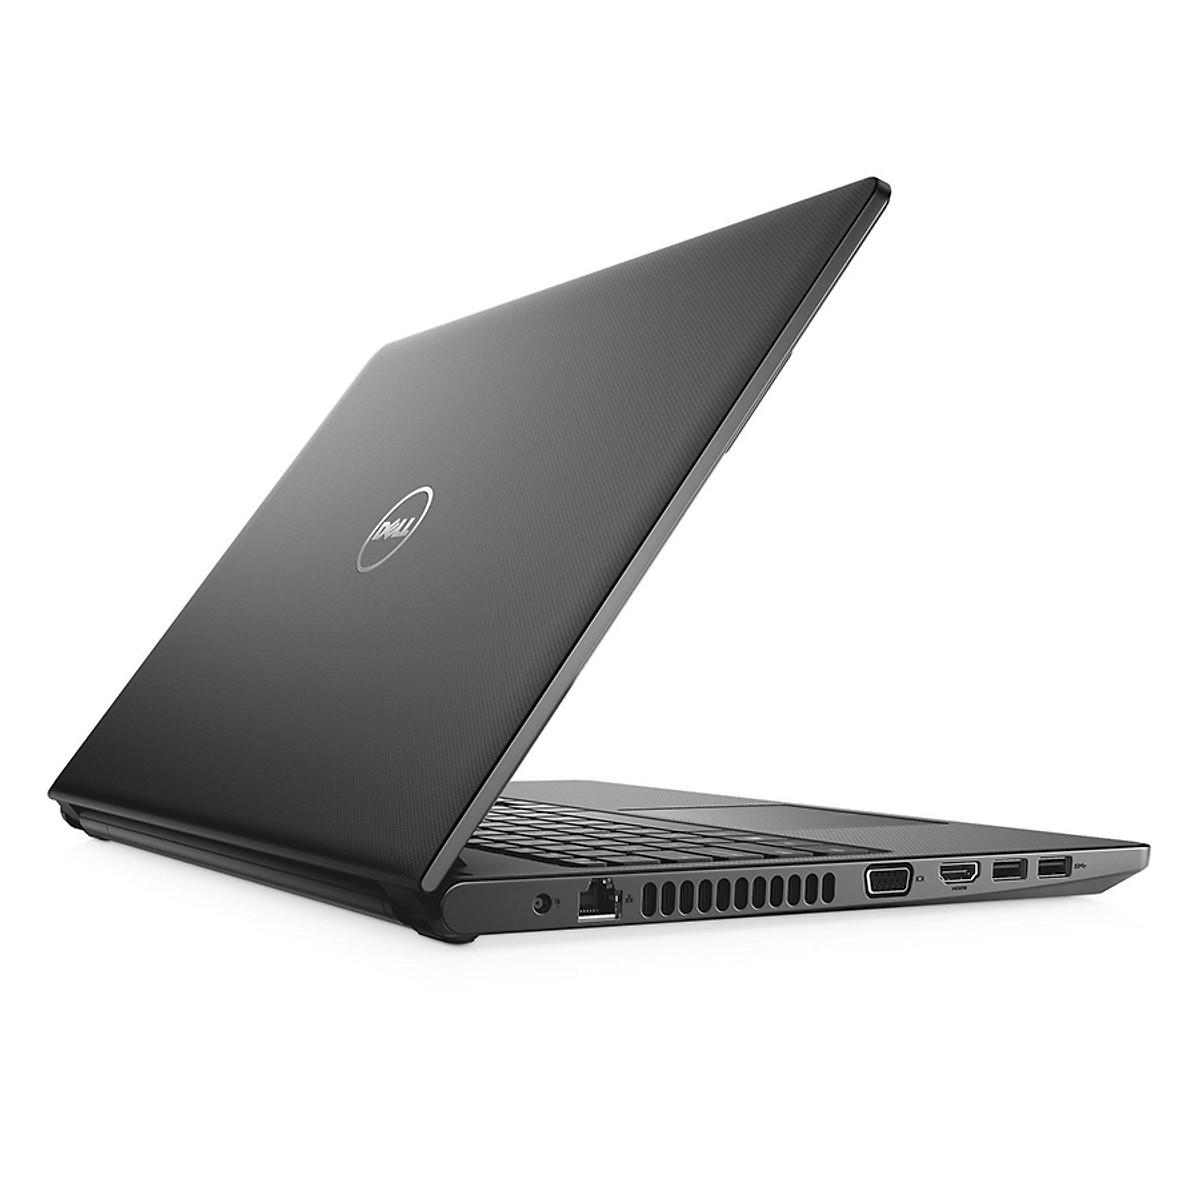 Laptop | Máy tính xách tay | Dell Vostro 3000 series Vostro 3578-NGMPF22